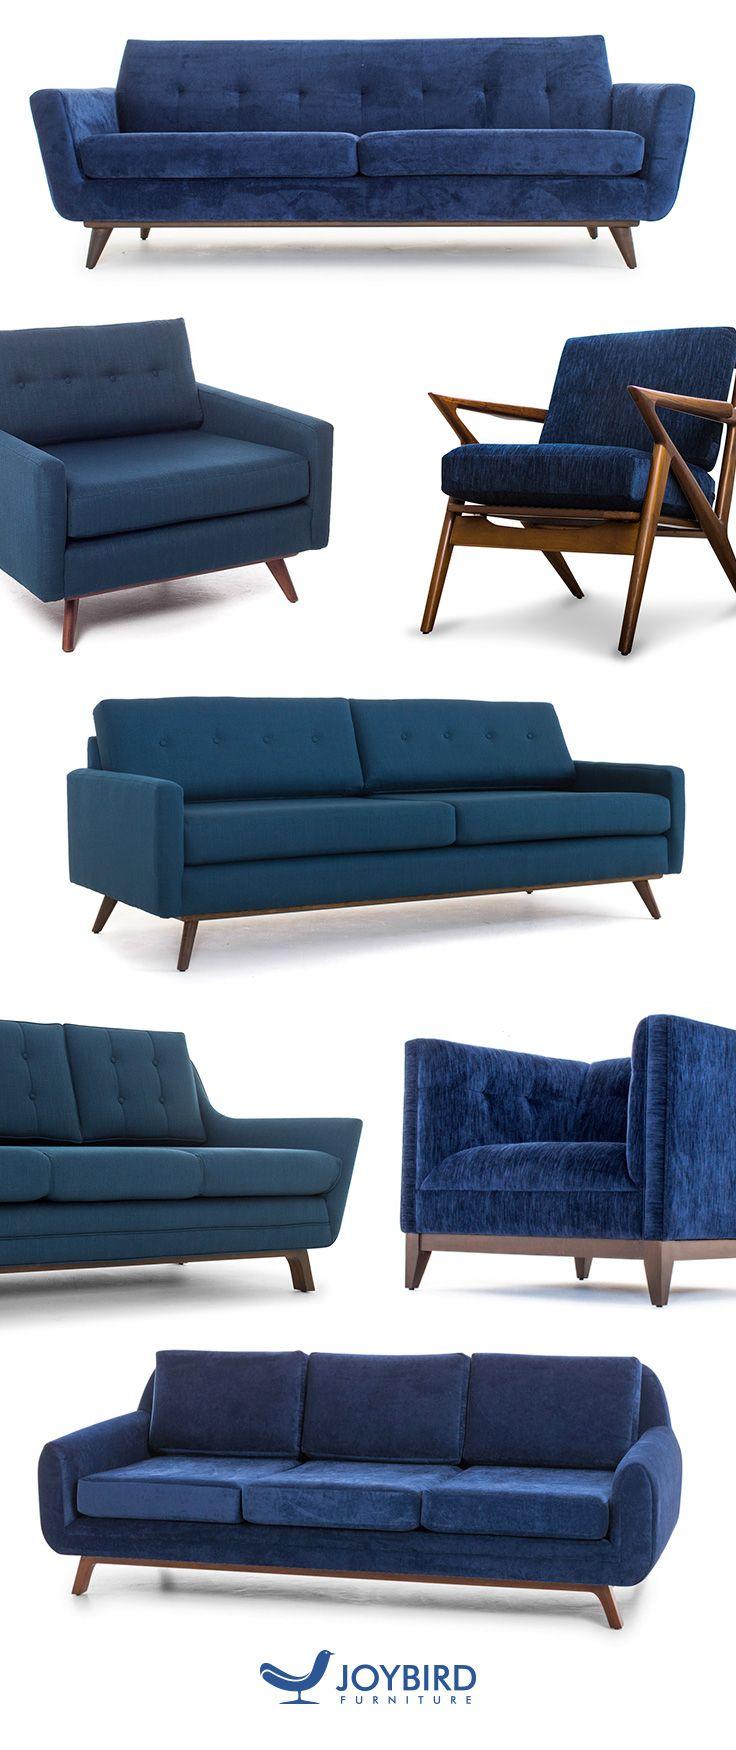 Best 25+ Quality furniture ideas on Pinterest | Garden ...